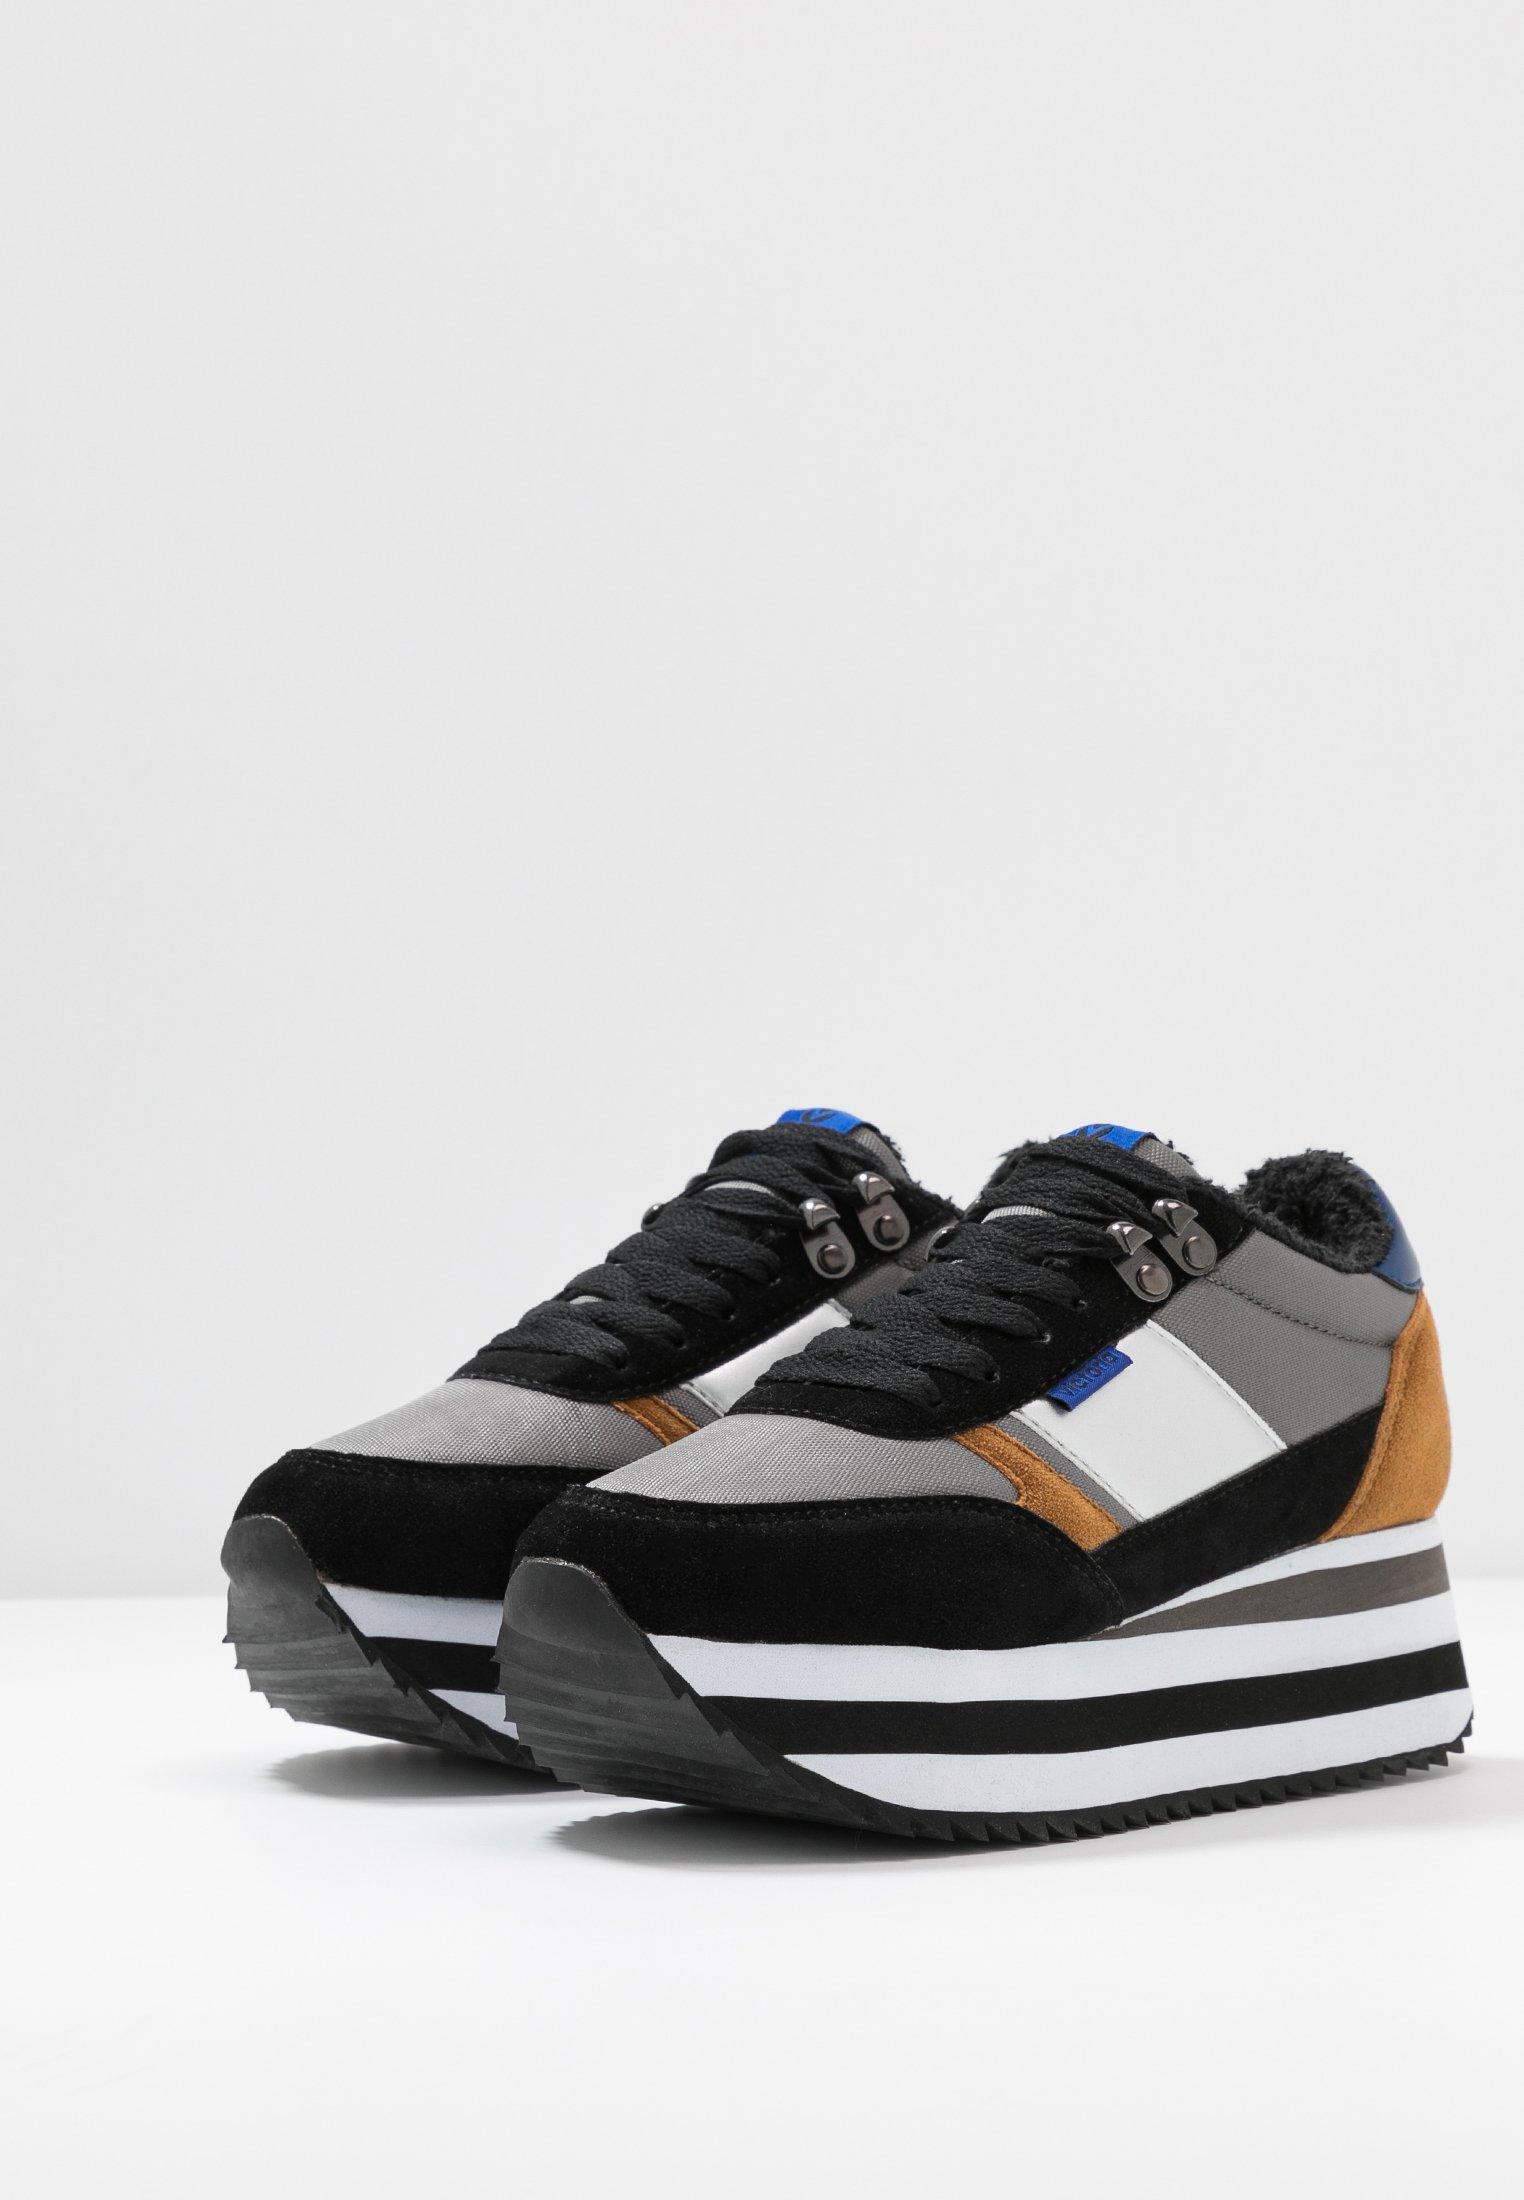 Azul DobleBaskets Basses Cometa Victoria Shoes 8wvmn0N